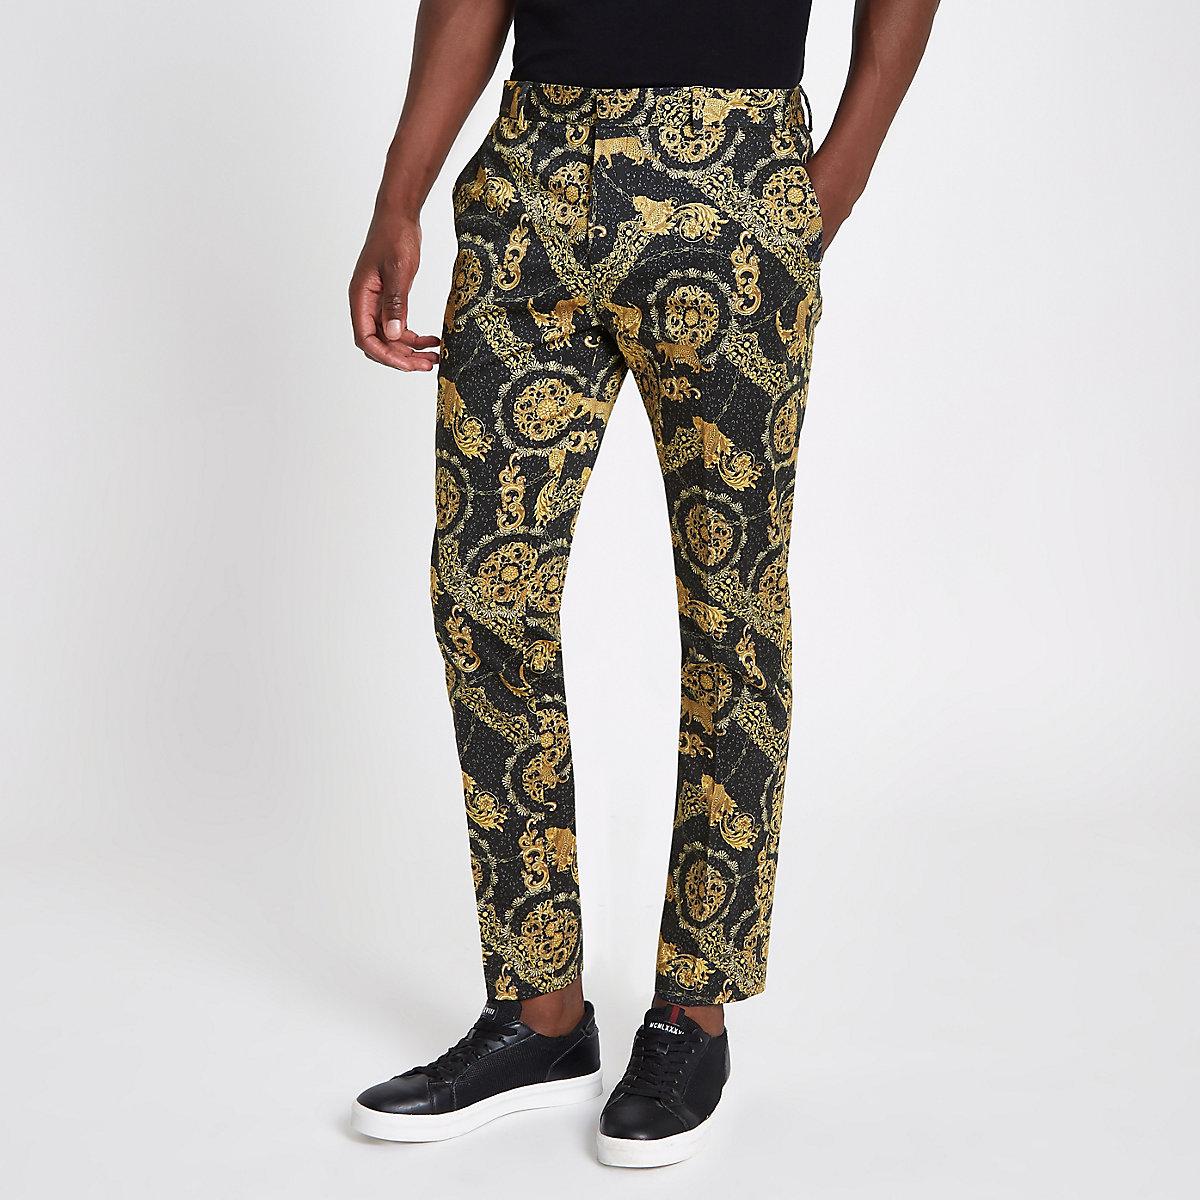 Black leopard printed skinny smart trousers